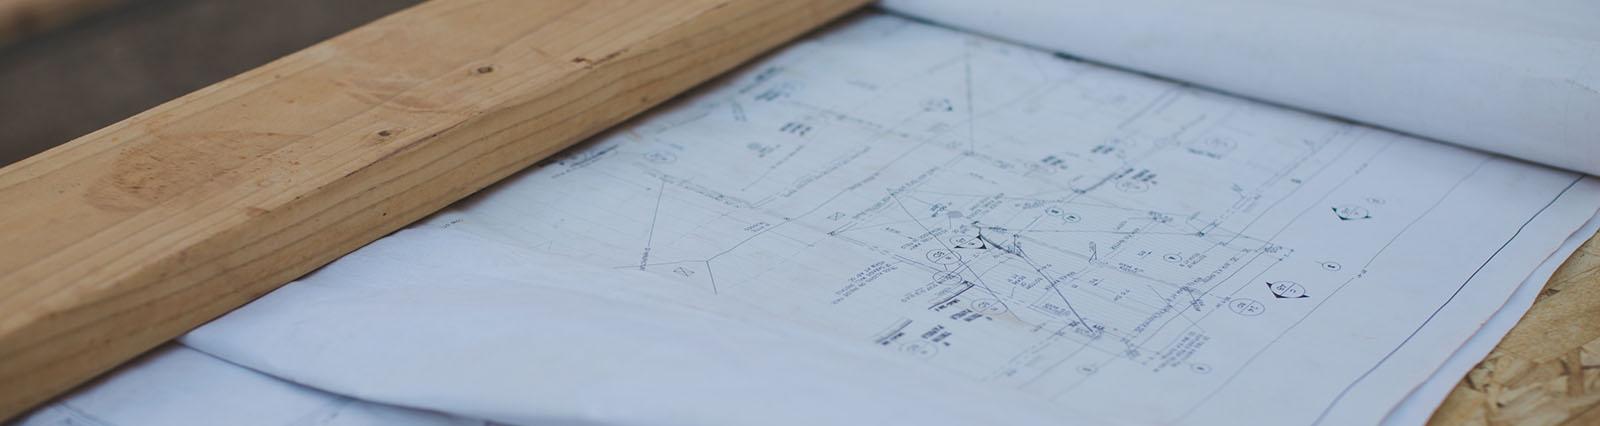 building-plan.jpg